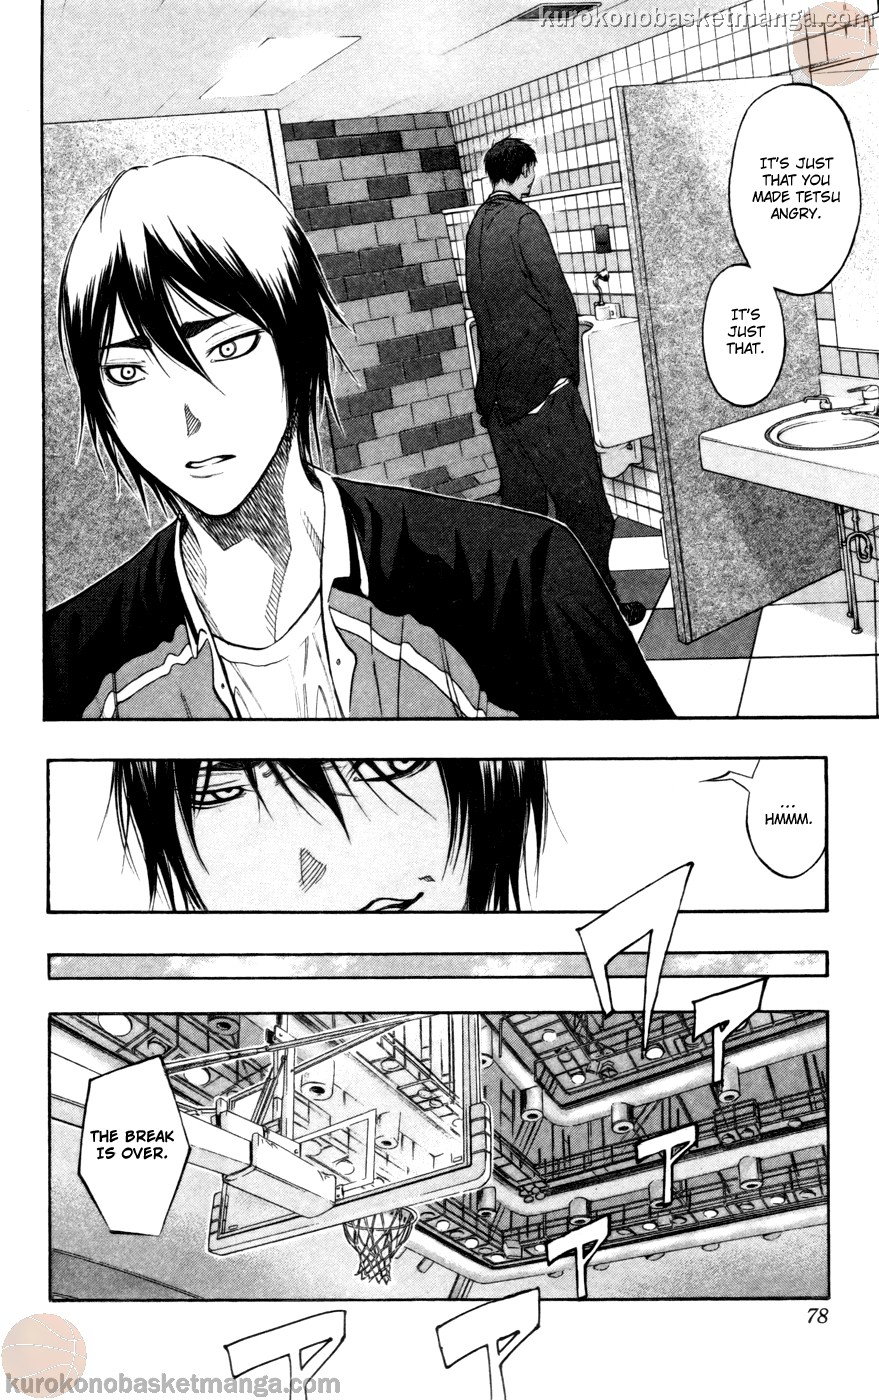 Kuroko no Basket Manga Chapter 103 - Image 12